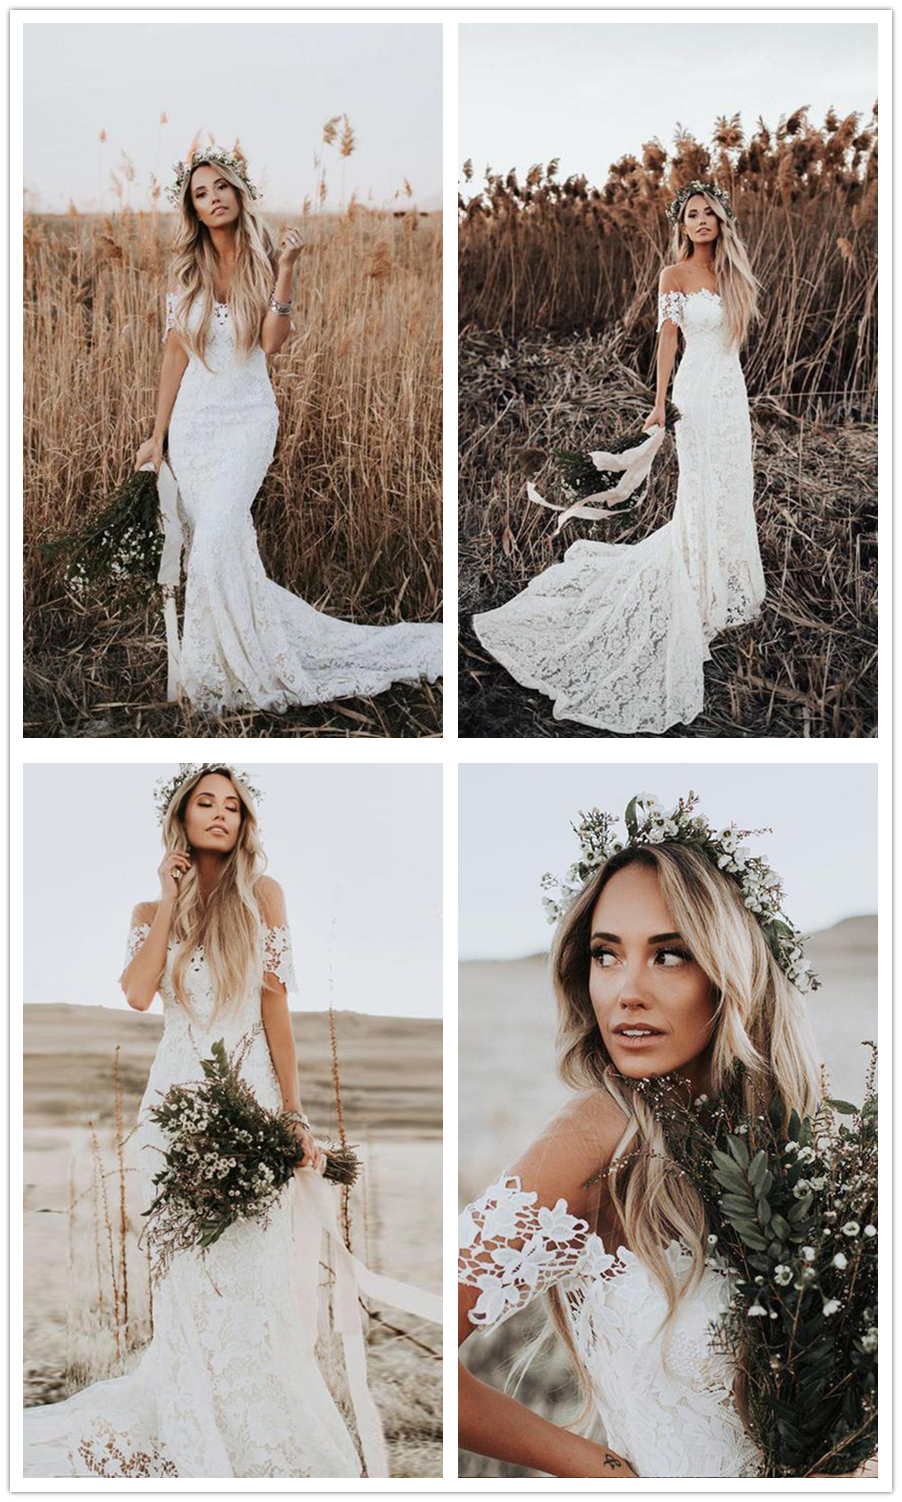 Mermaid round neck short sleeves lace beach wedding dress